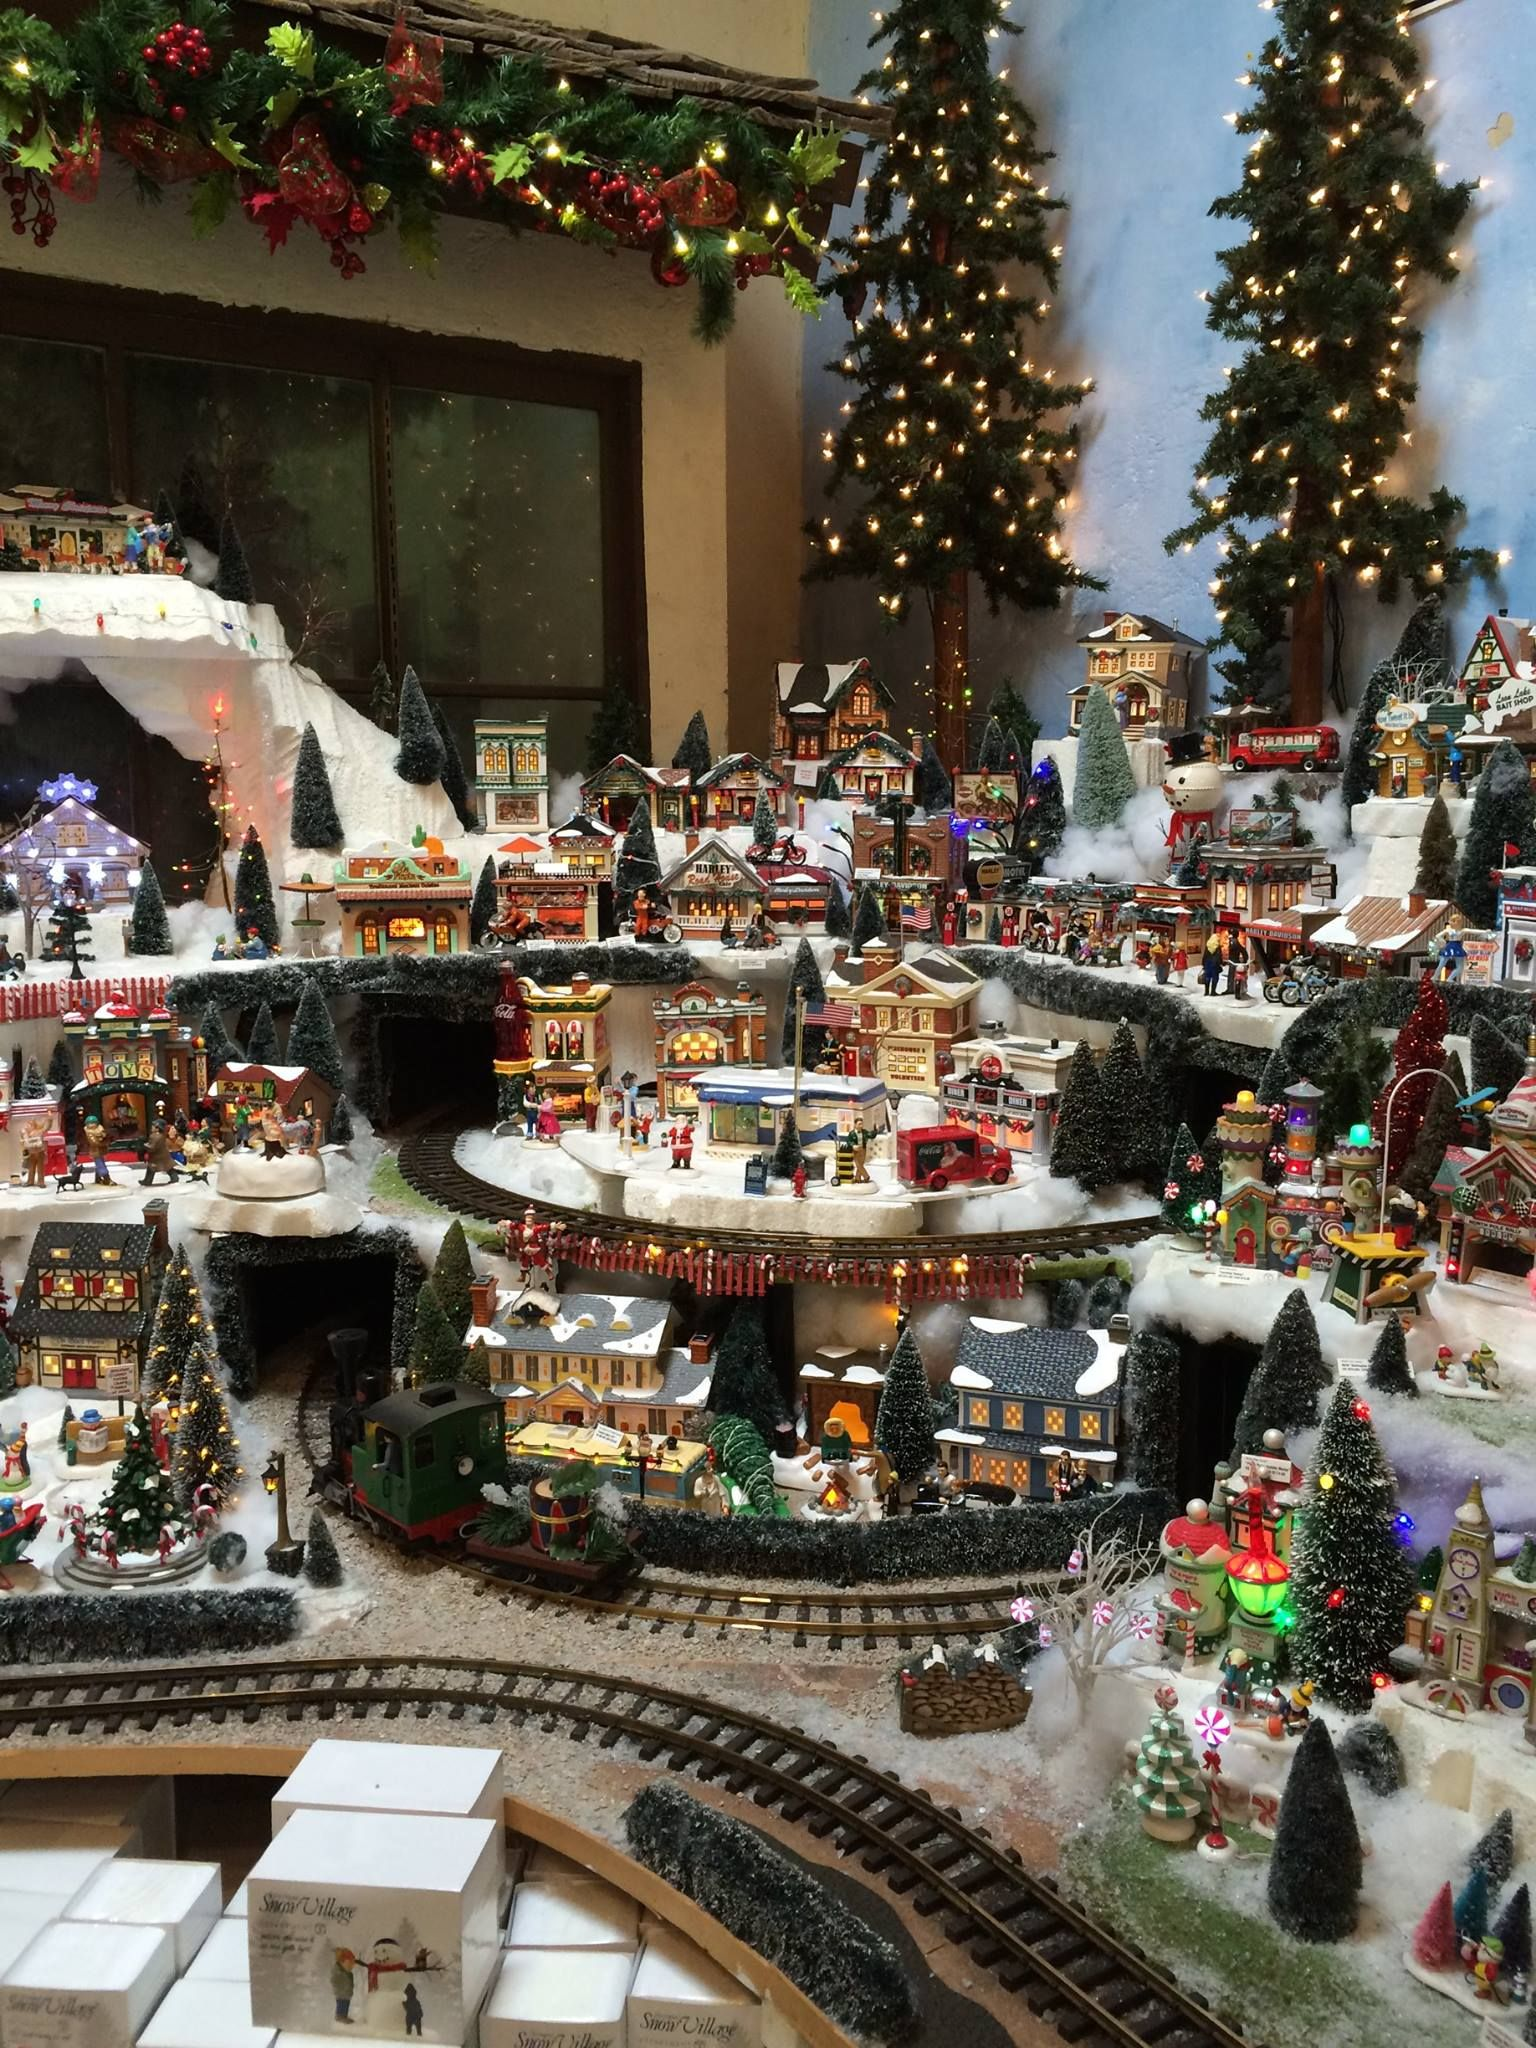 Pin by Danielle Copeland on Christmas   Christmas tree train, Christmas village display, Diy ...